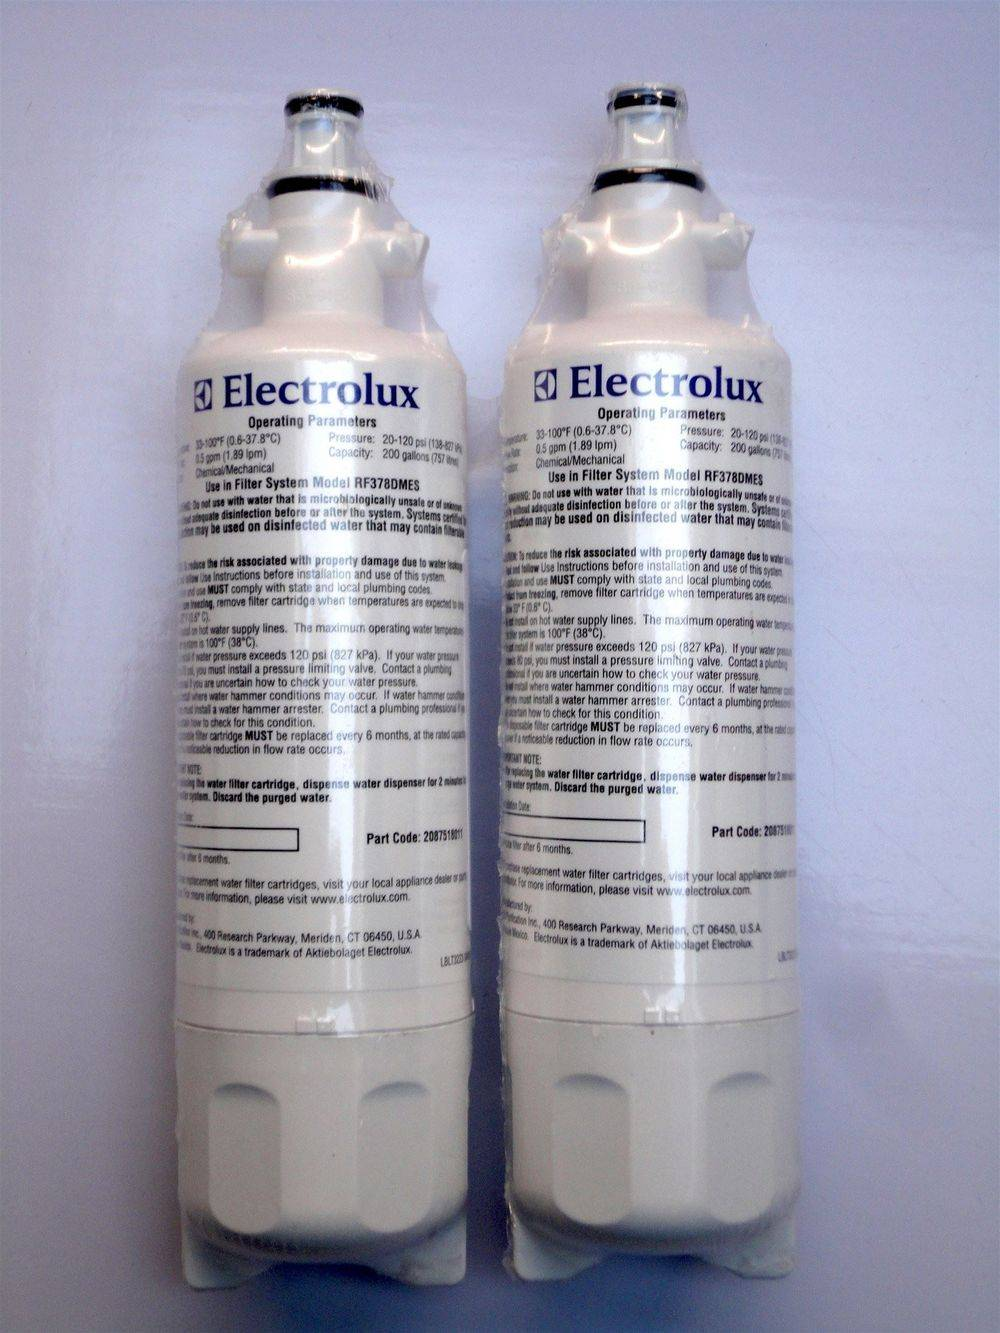 Husqvarna - Electrolux - 2087518011 - refrigerator fridge water filter cartridge - sold at www.aaafilterfast.com